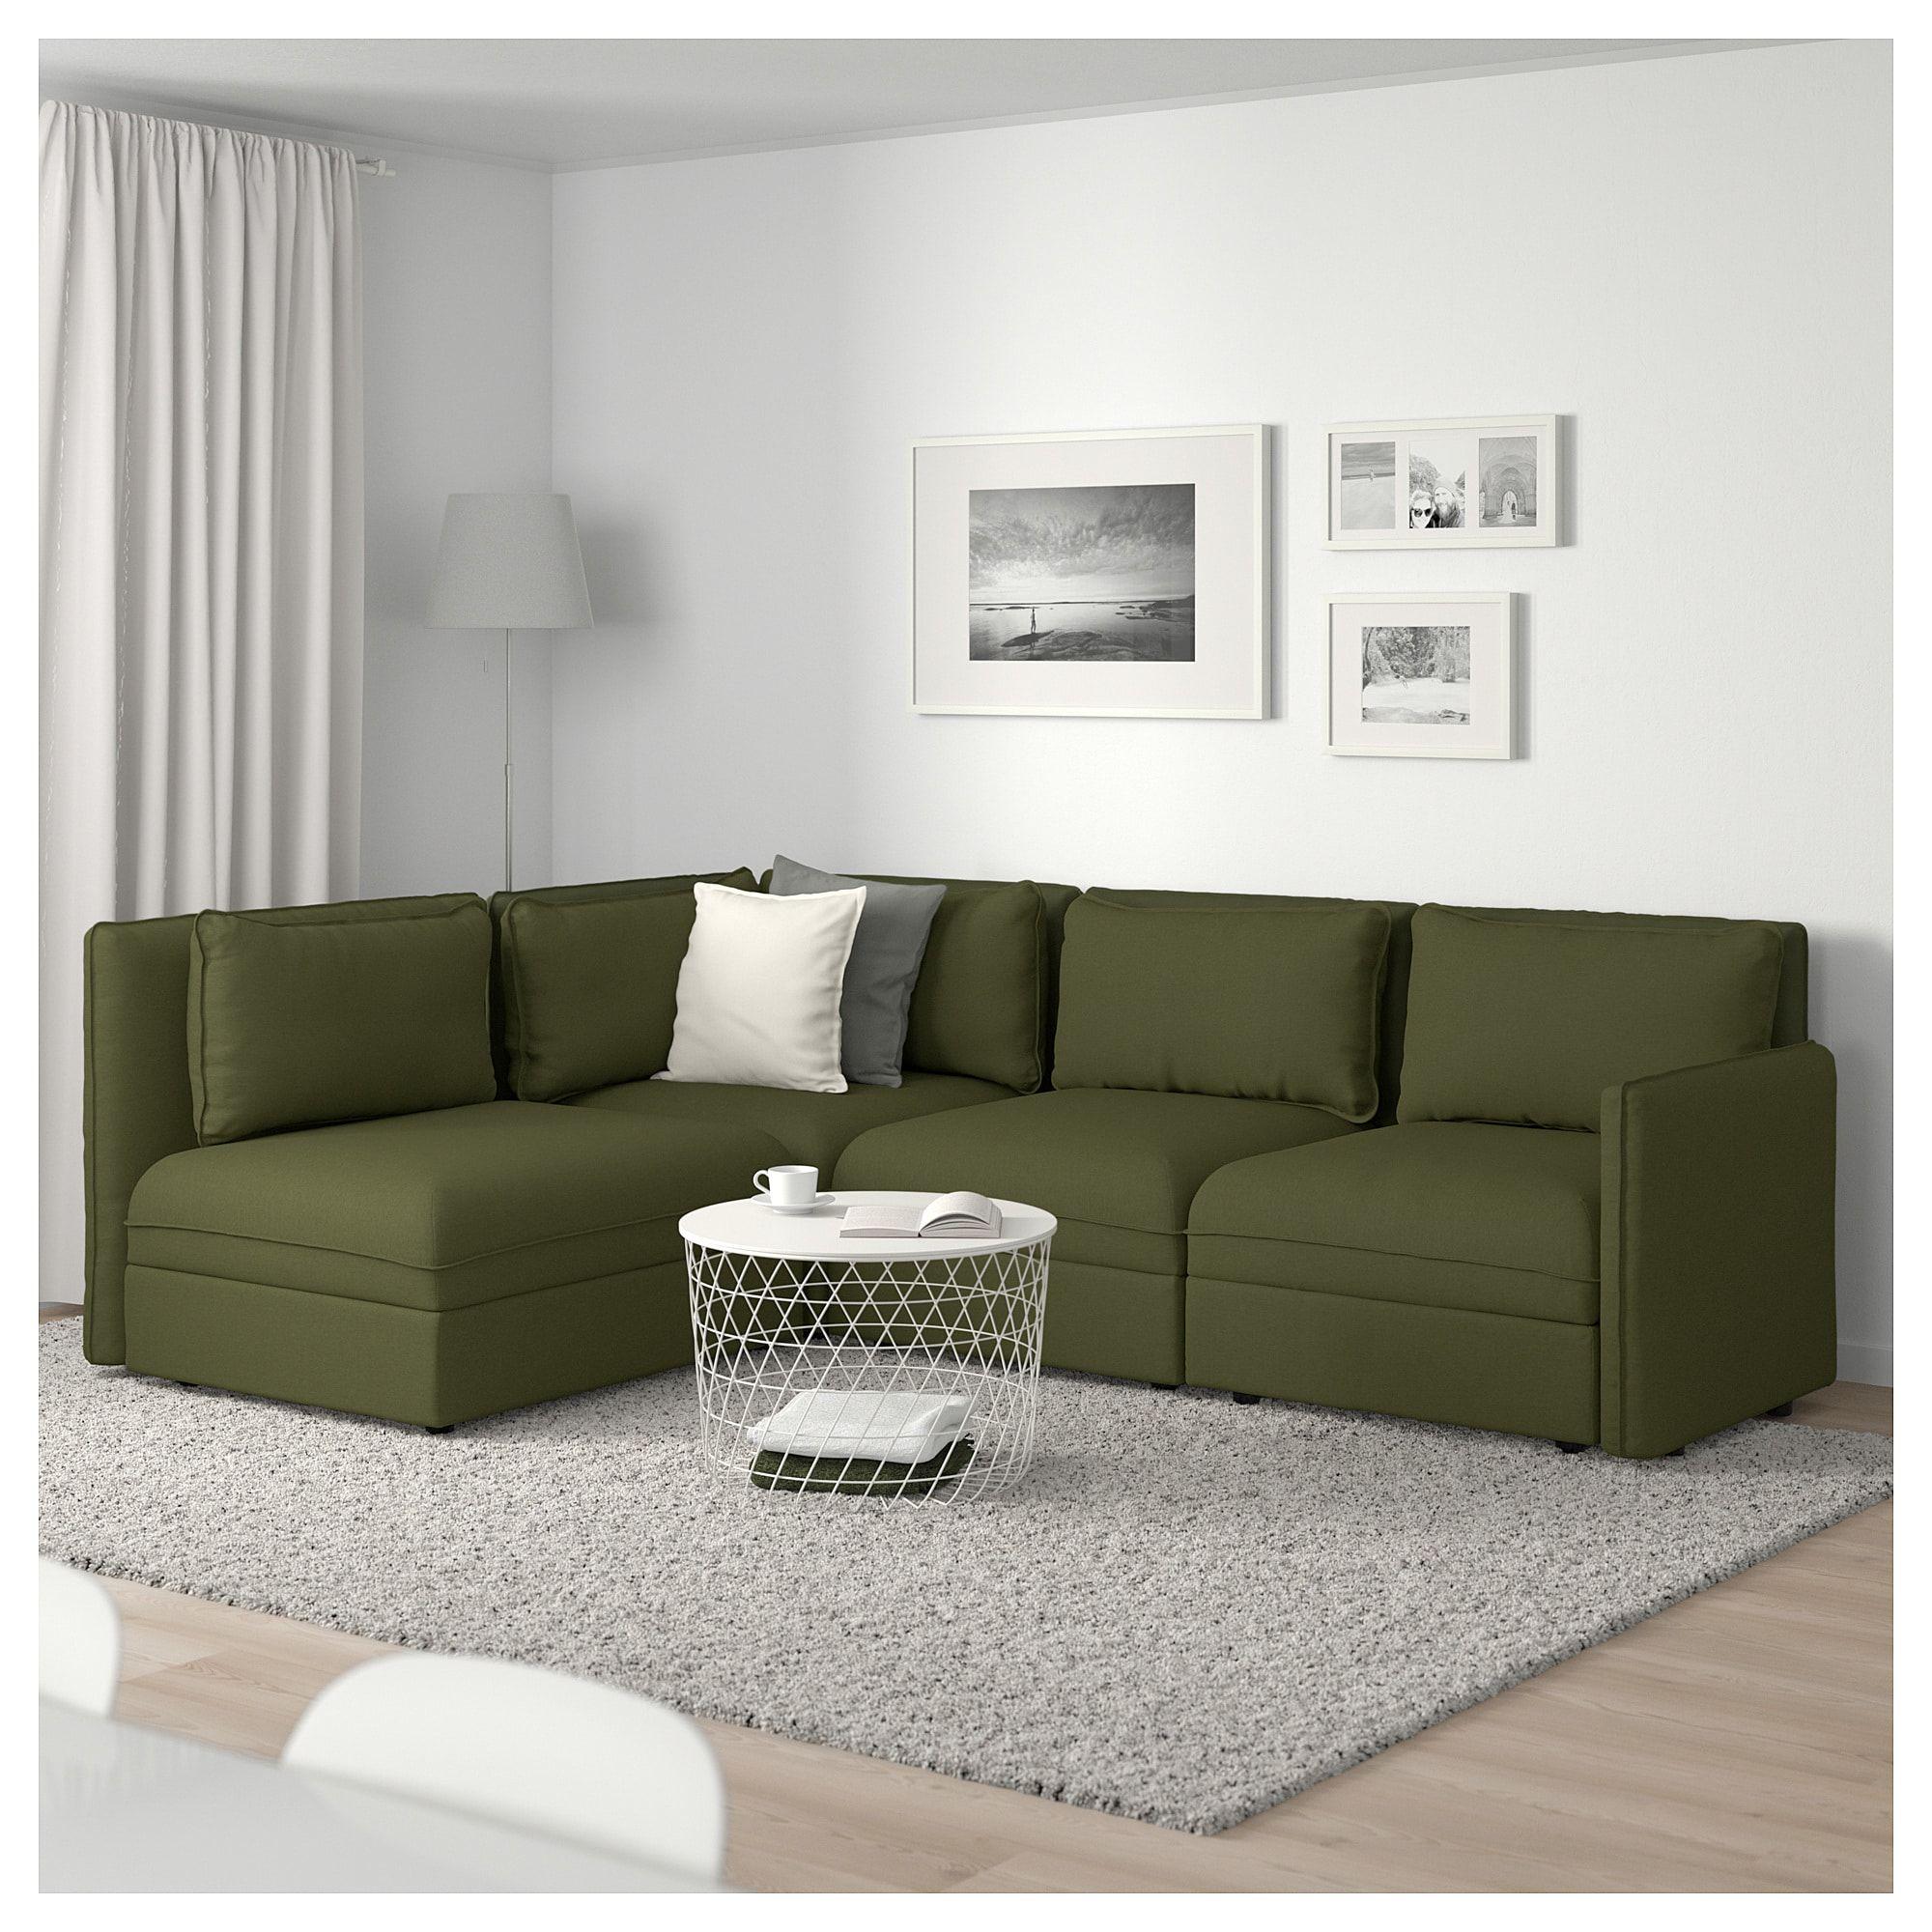 IKEA VALLENTUNA Modular corner sofa, 3seat Modular